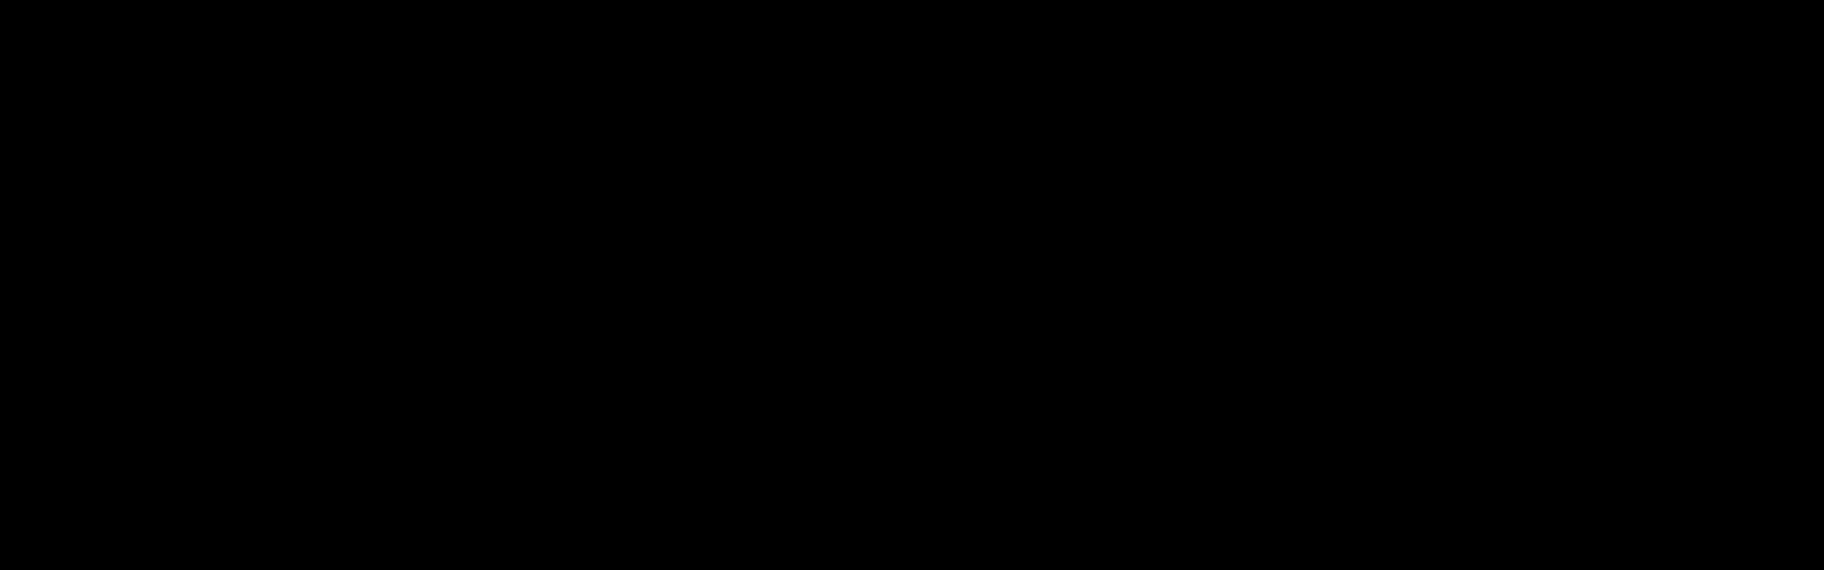 2-[[2-(Acetyloxy)benzoyl]oxy]benzoic acid 2-carboxyphenyl ester